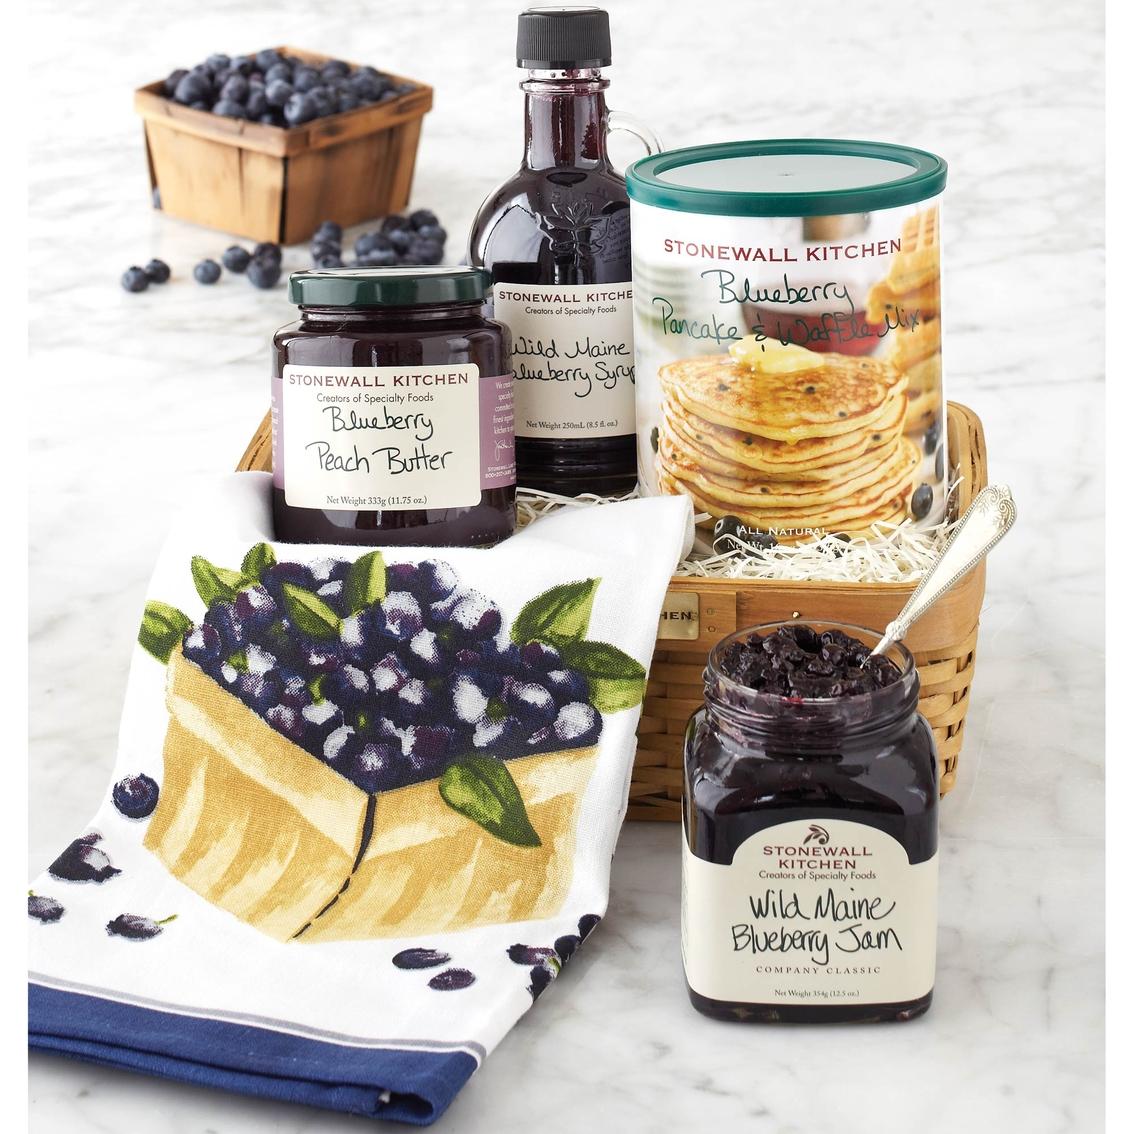 Stonewall Kitchen Blueberry Breakfast Gift Set